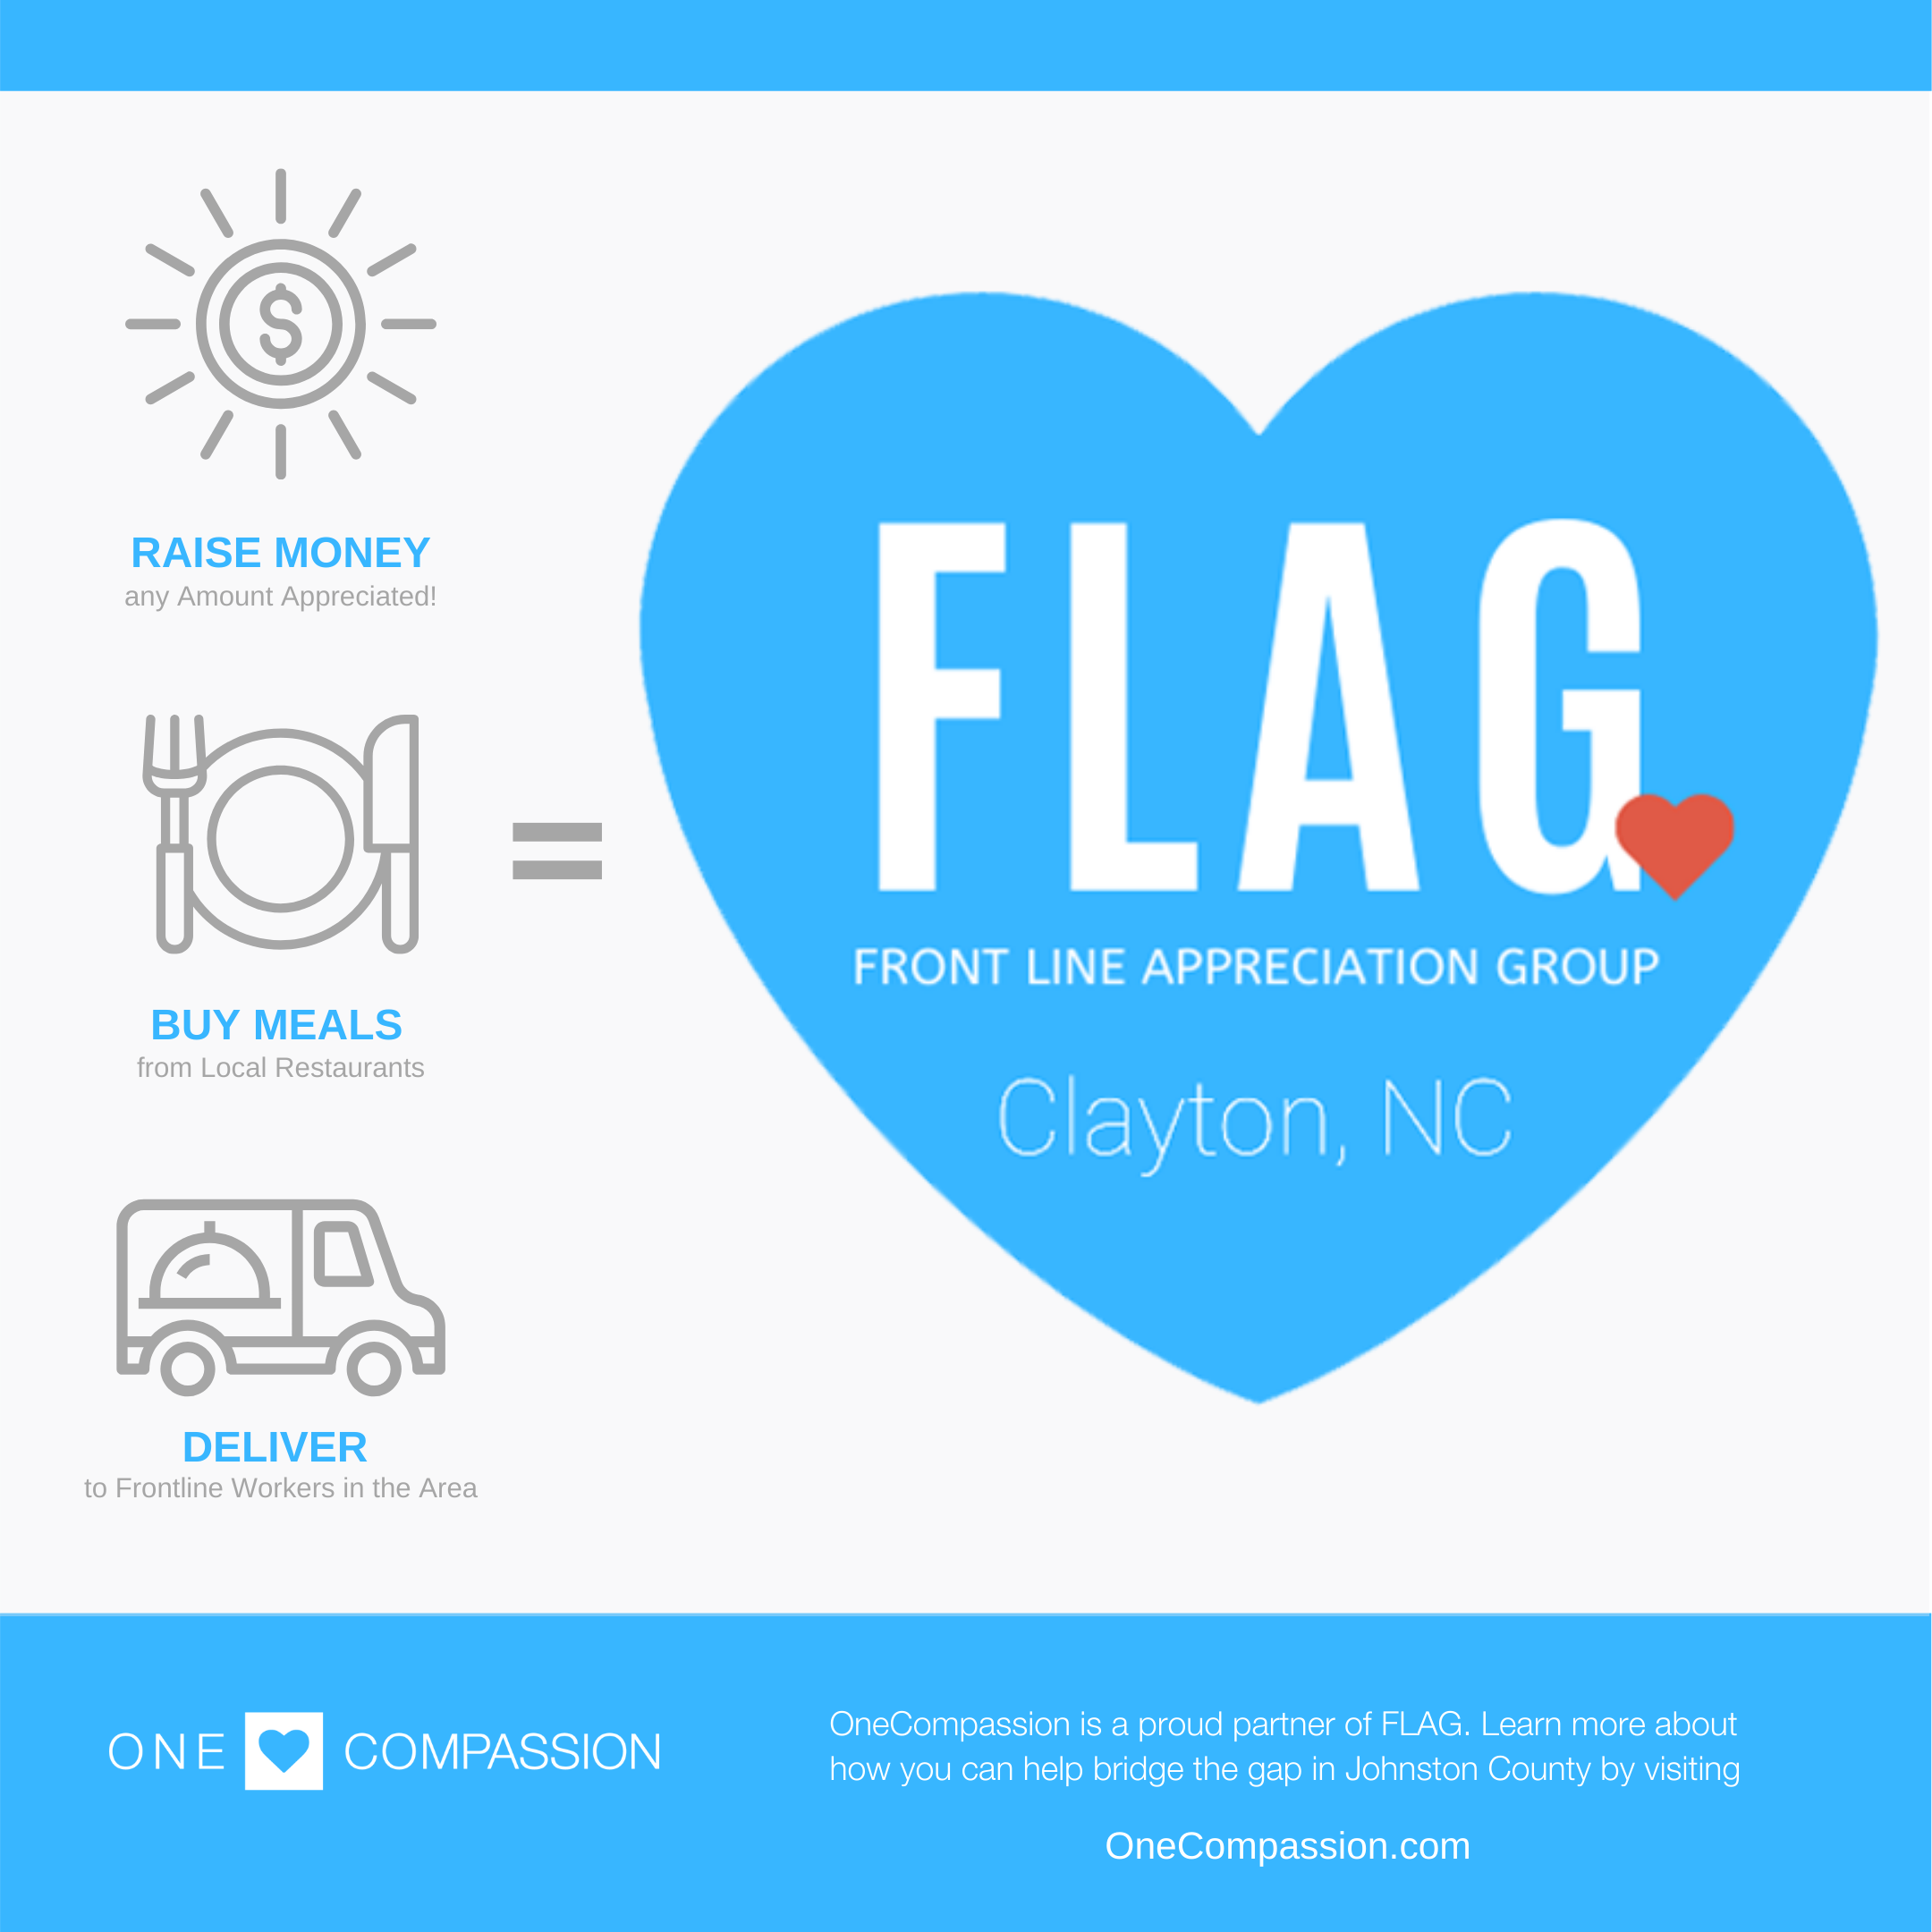 FLAG of Clayton